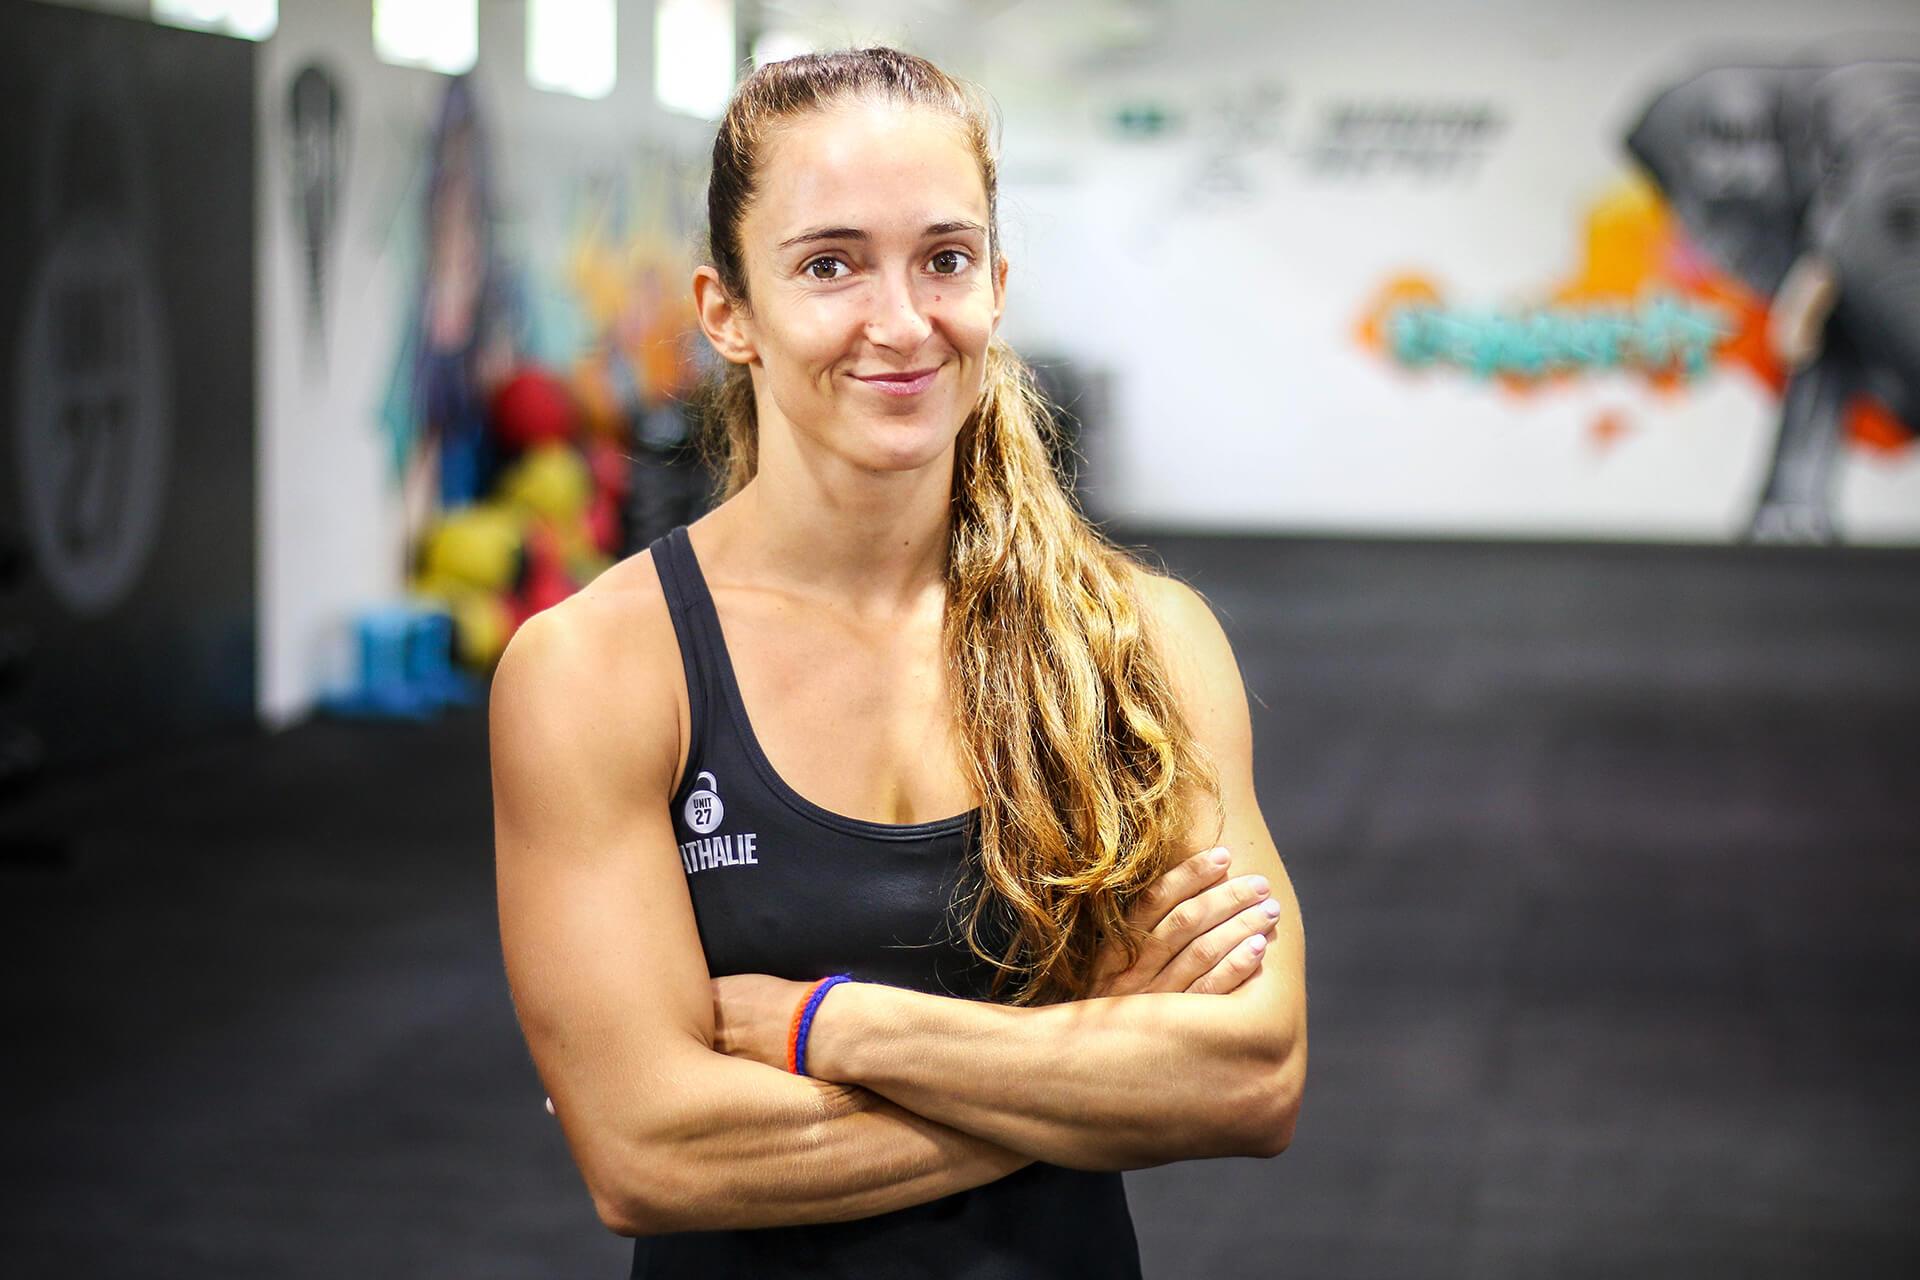 Nathalie Bruynooghe